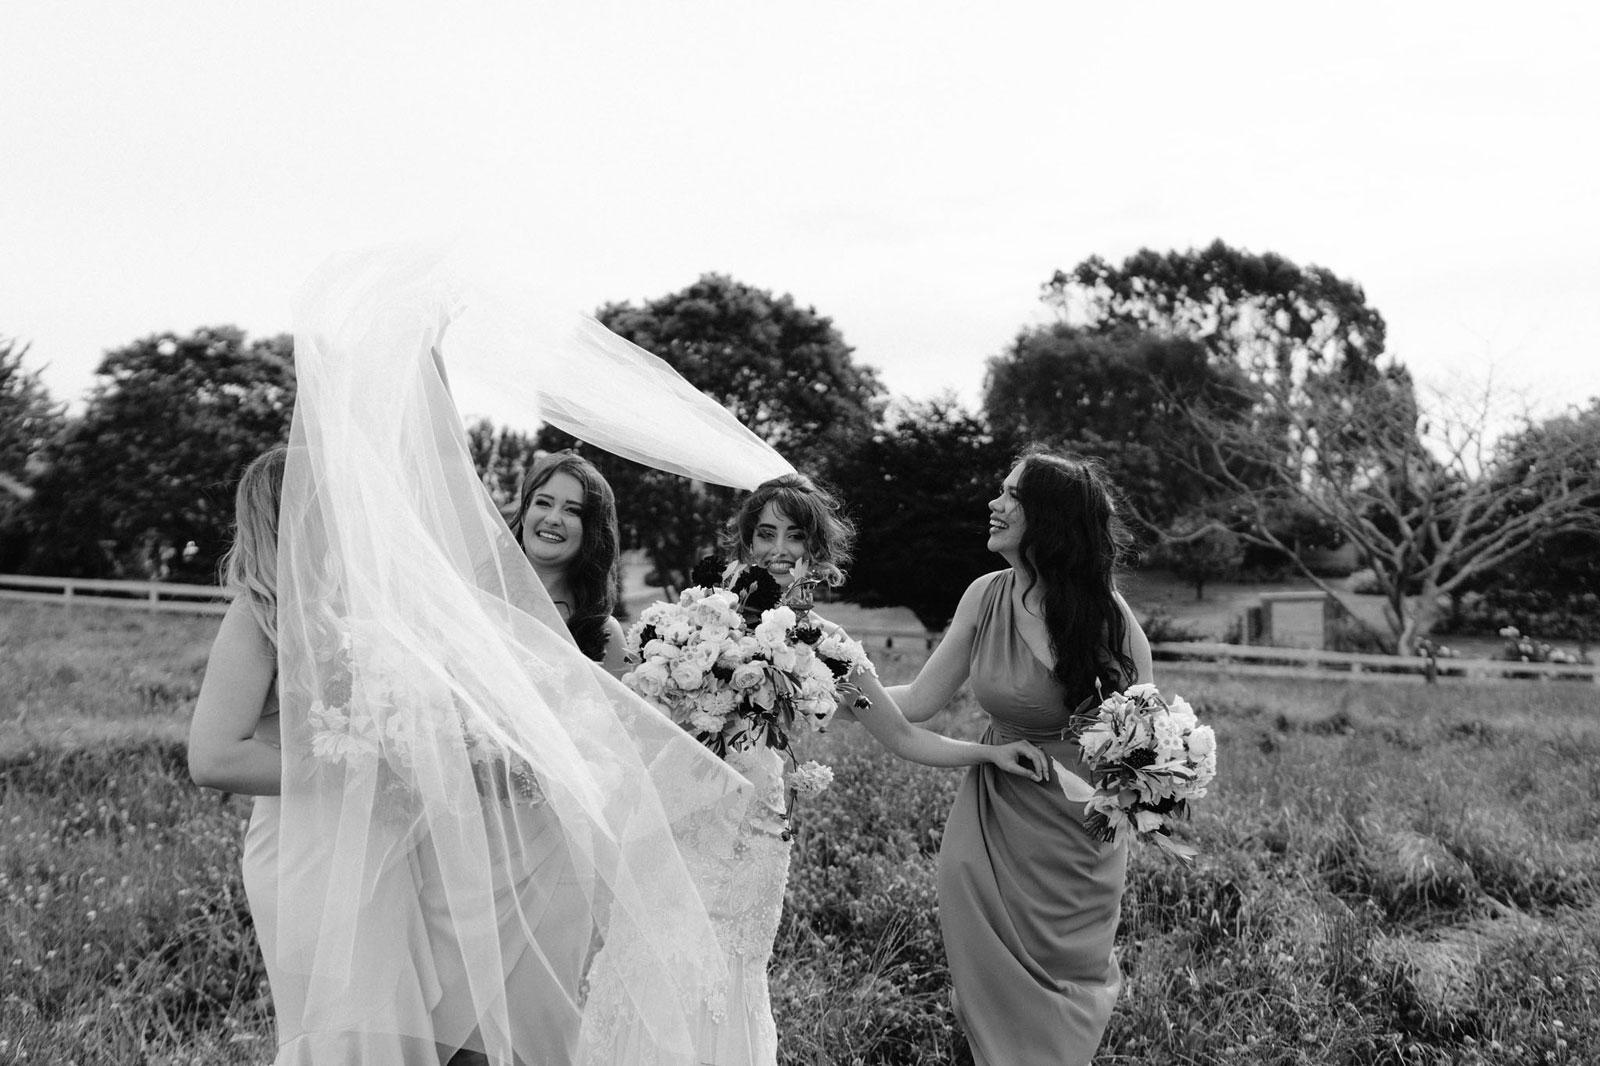 newfound-n-c-olive-tree-cottage-tauranga-wedding-photographer-694